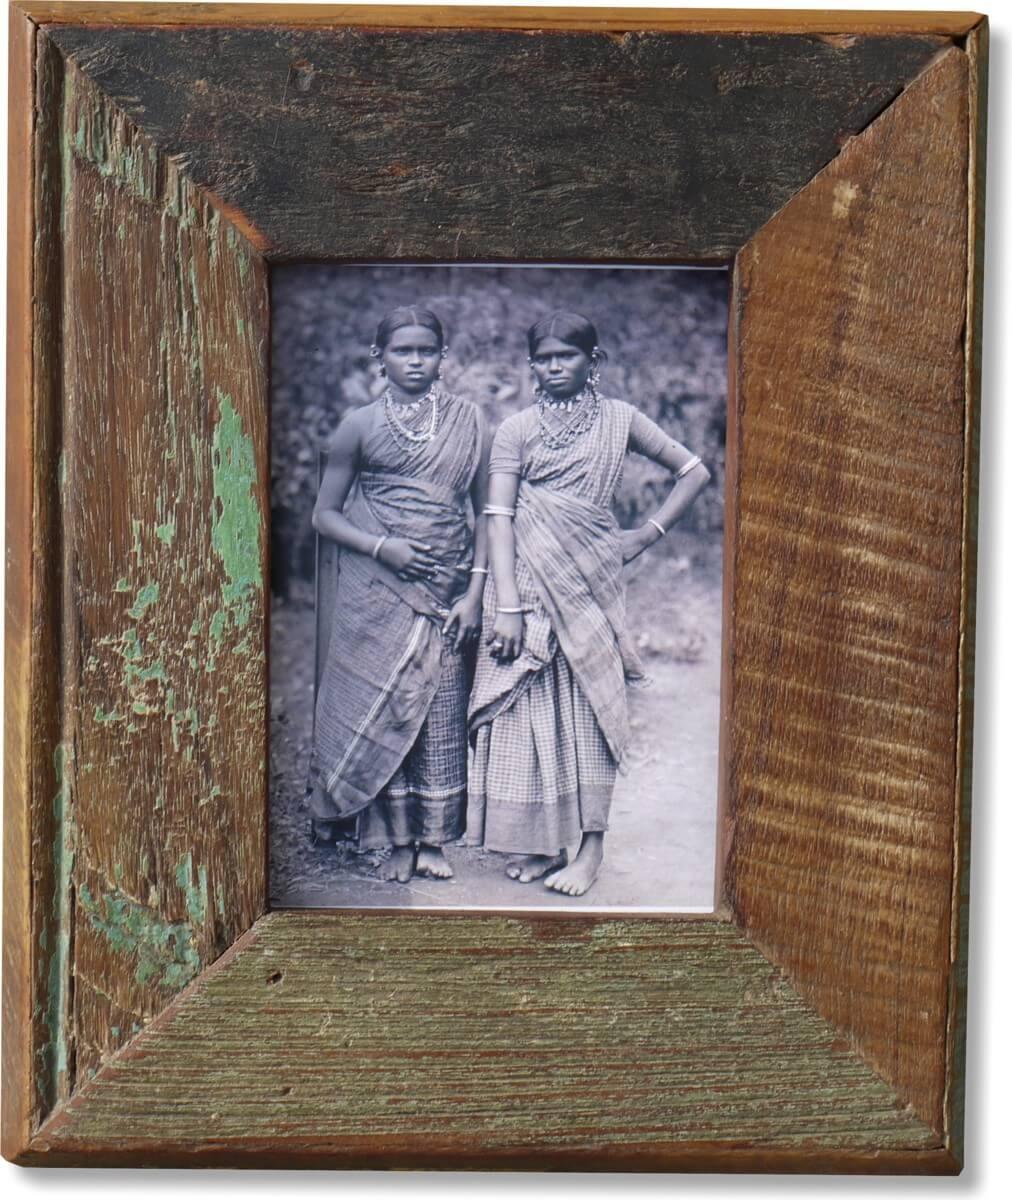 Bilderrahmen Holz Recycling ~   Bilderrahmen  Classic, 10x15cm mit Farbresten aus recyceltem Holz